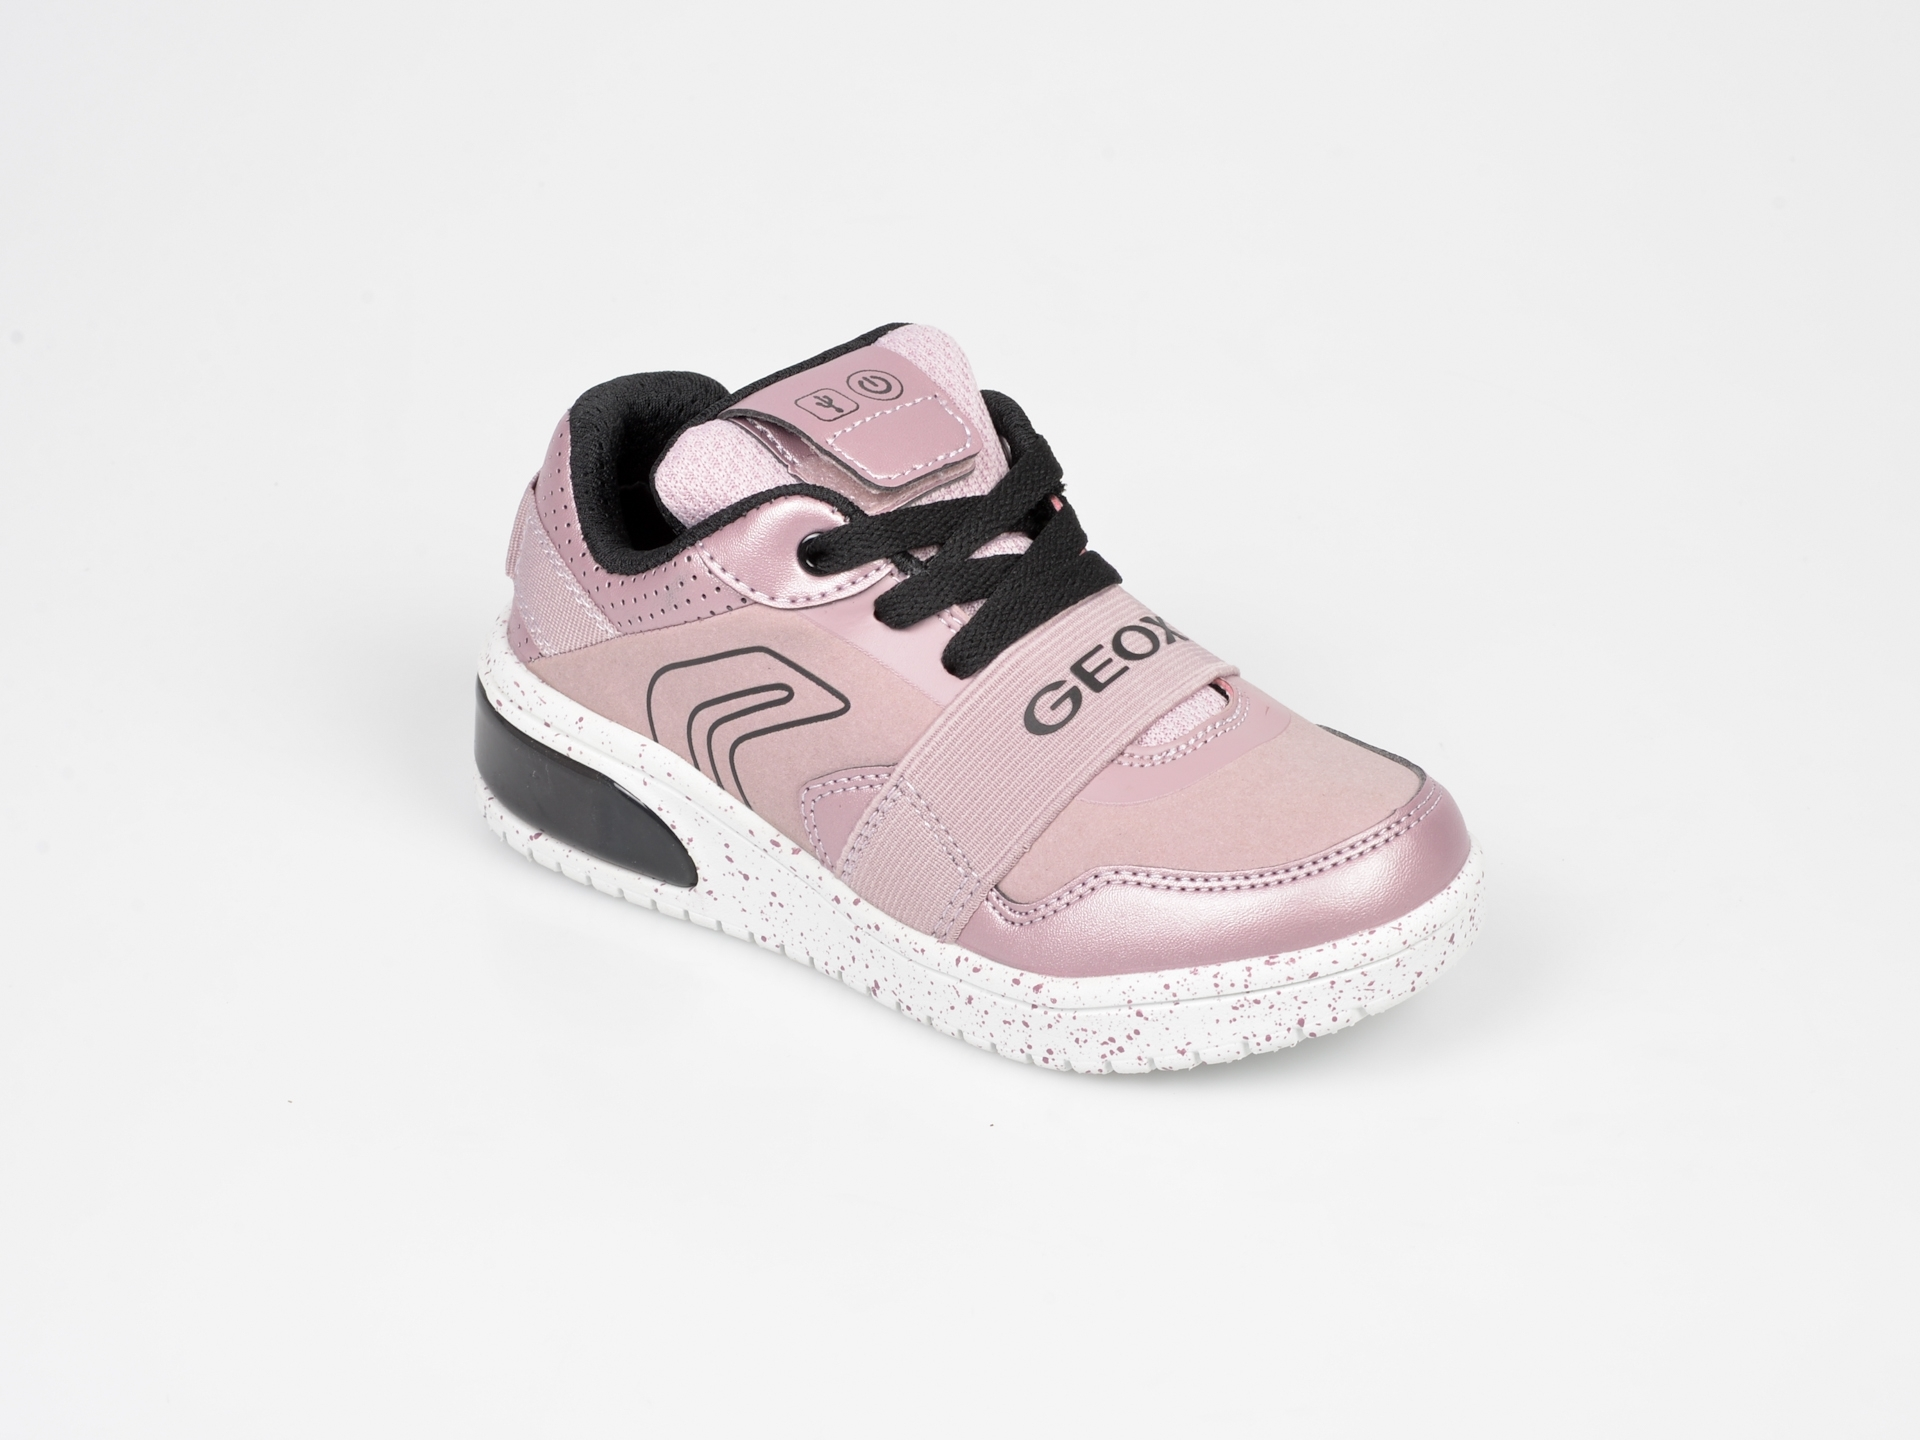 Pantofi Geox Roz, J928da, Din Piele Ecologica